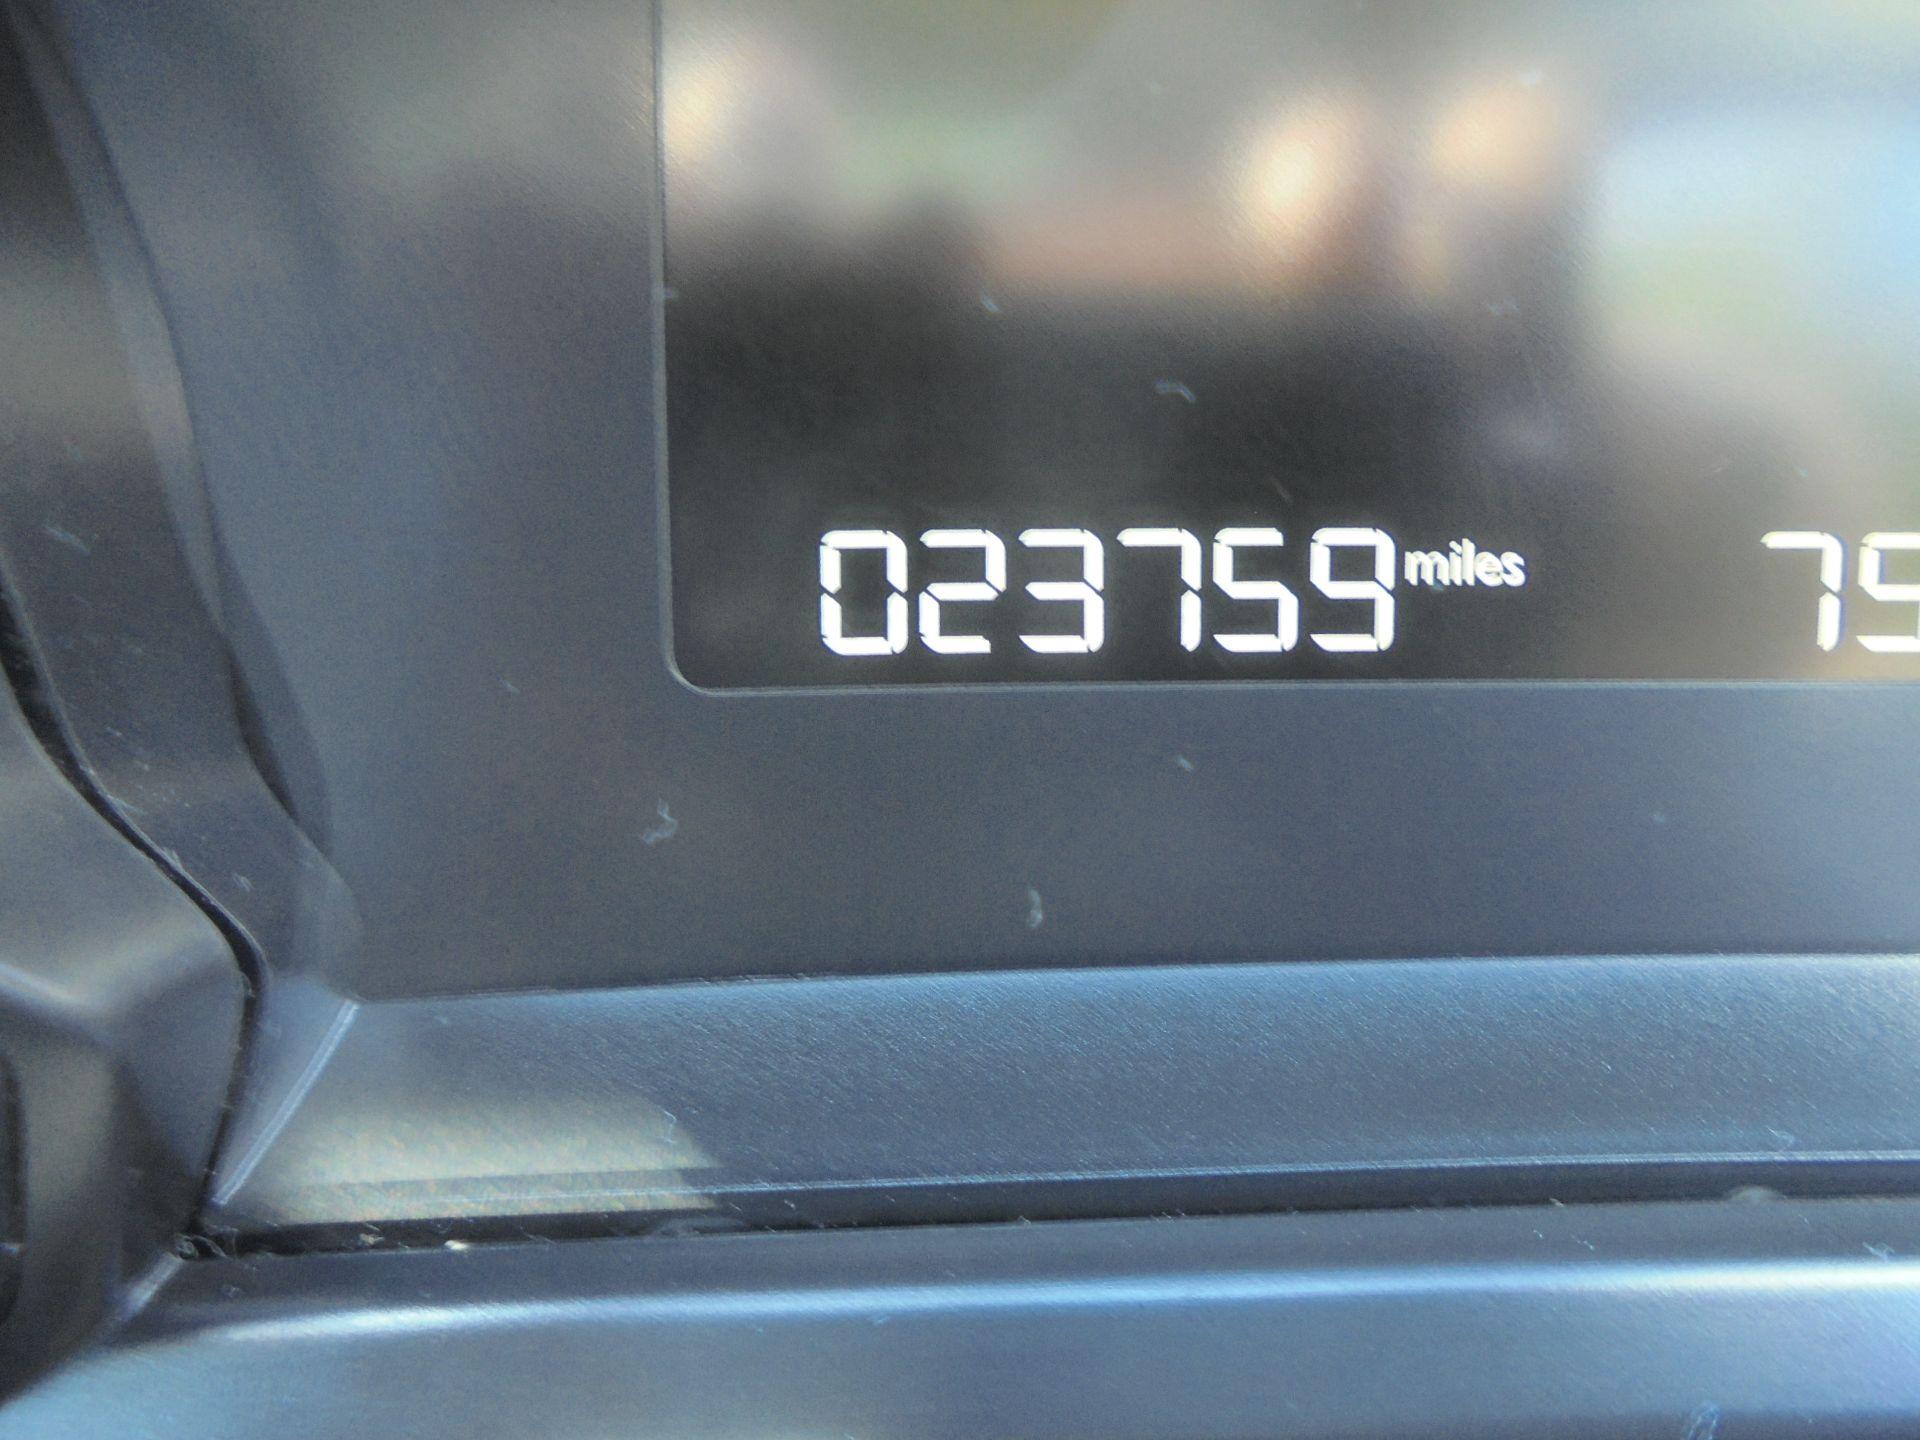 2018 Peugeot 308 1.5 Bluehdi 130 Allure 5Dr (NV18ZWP) Image 13